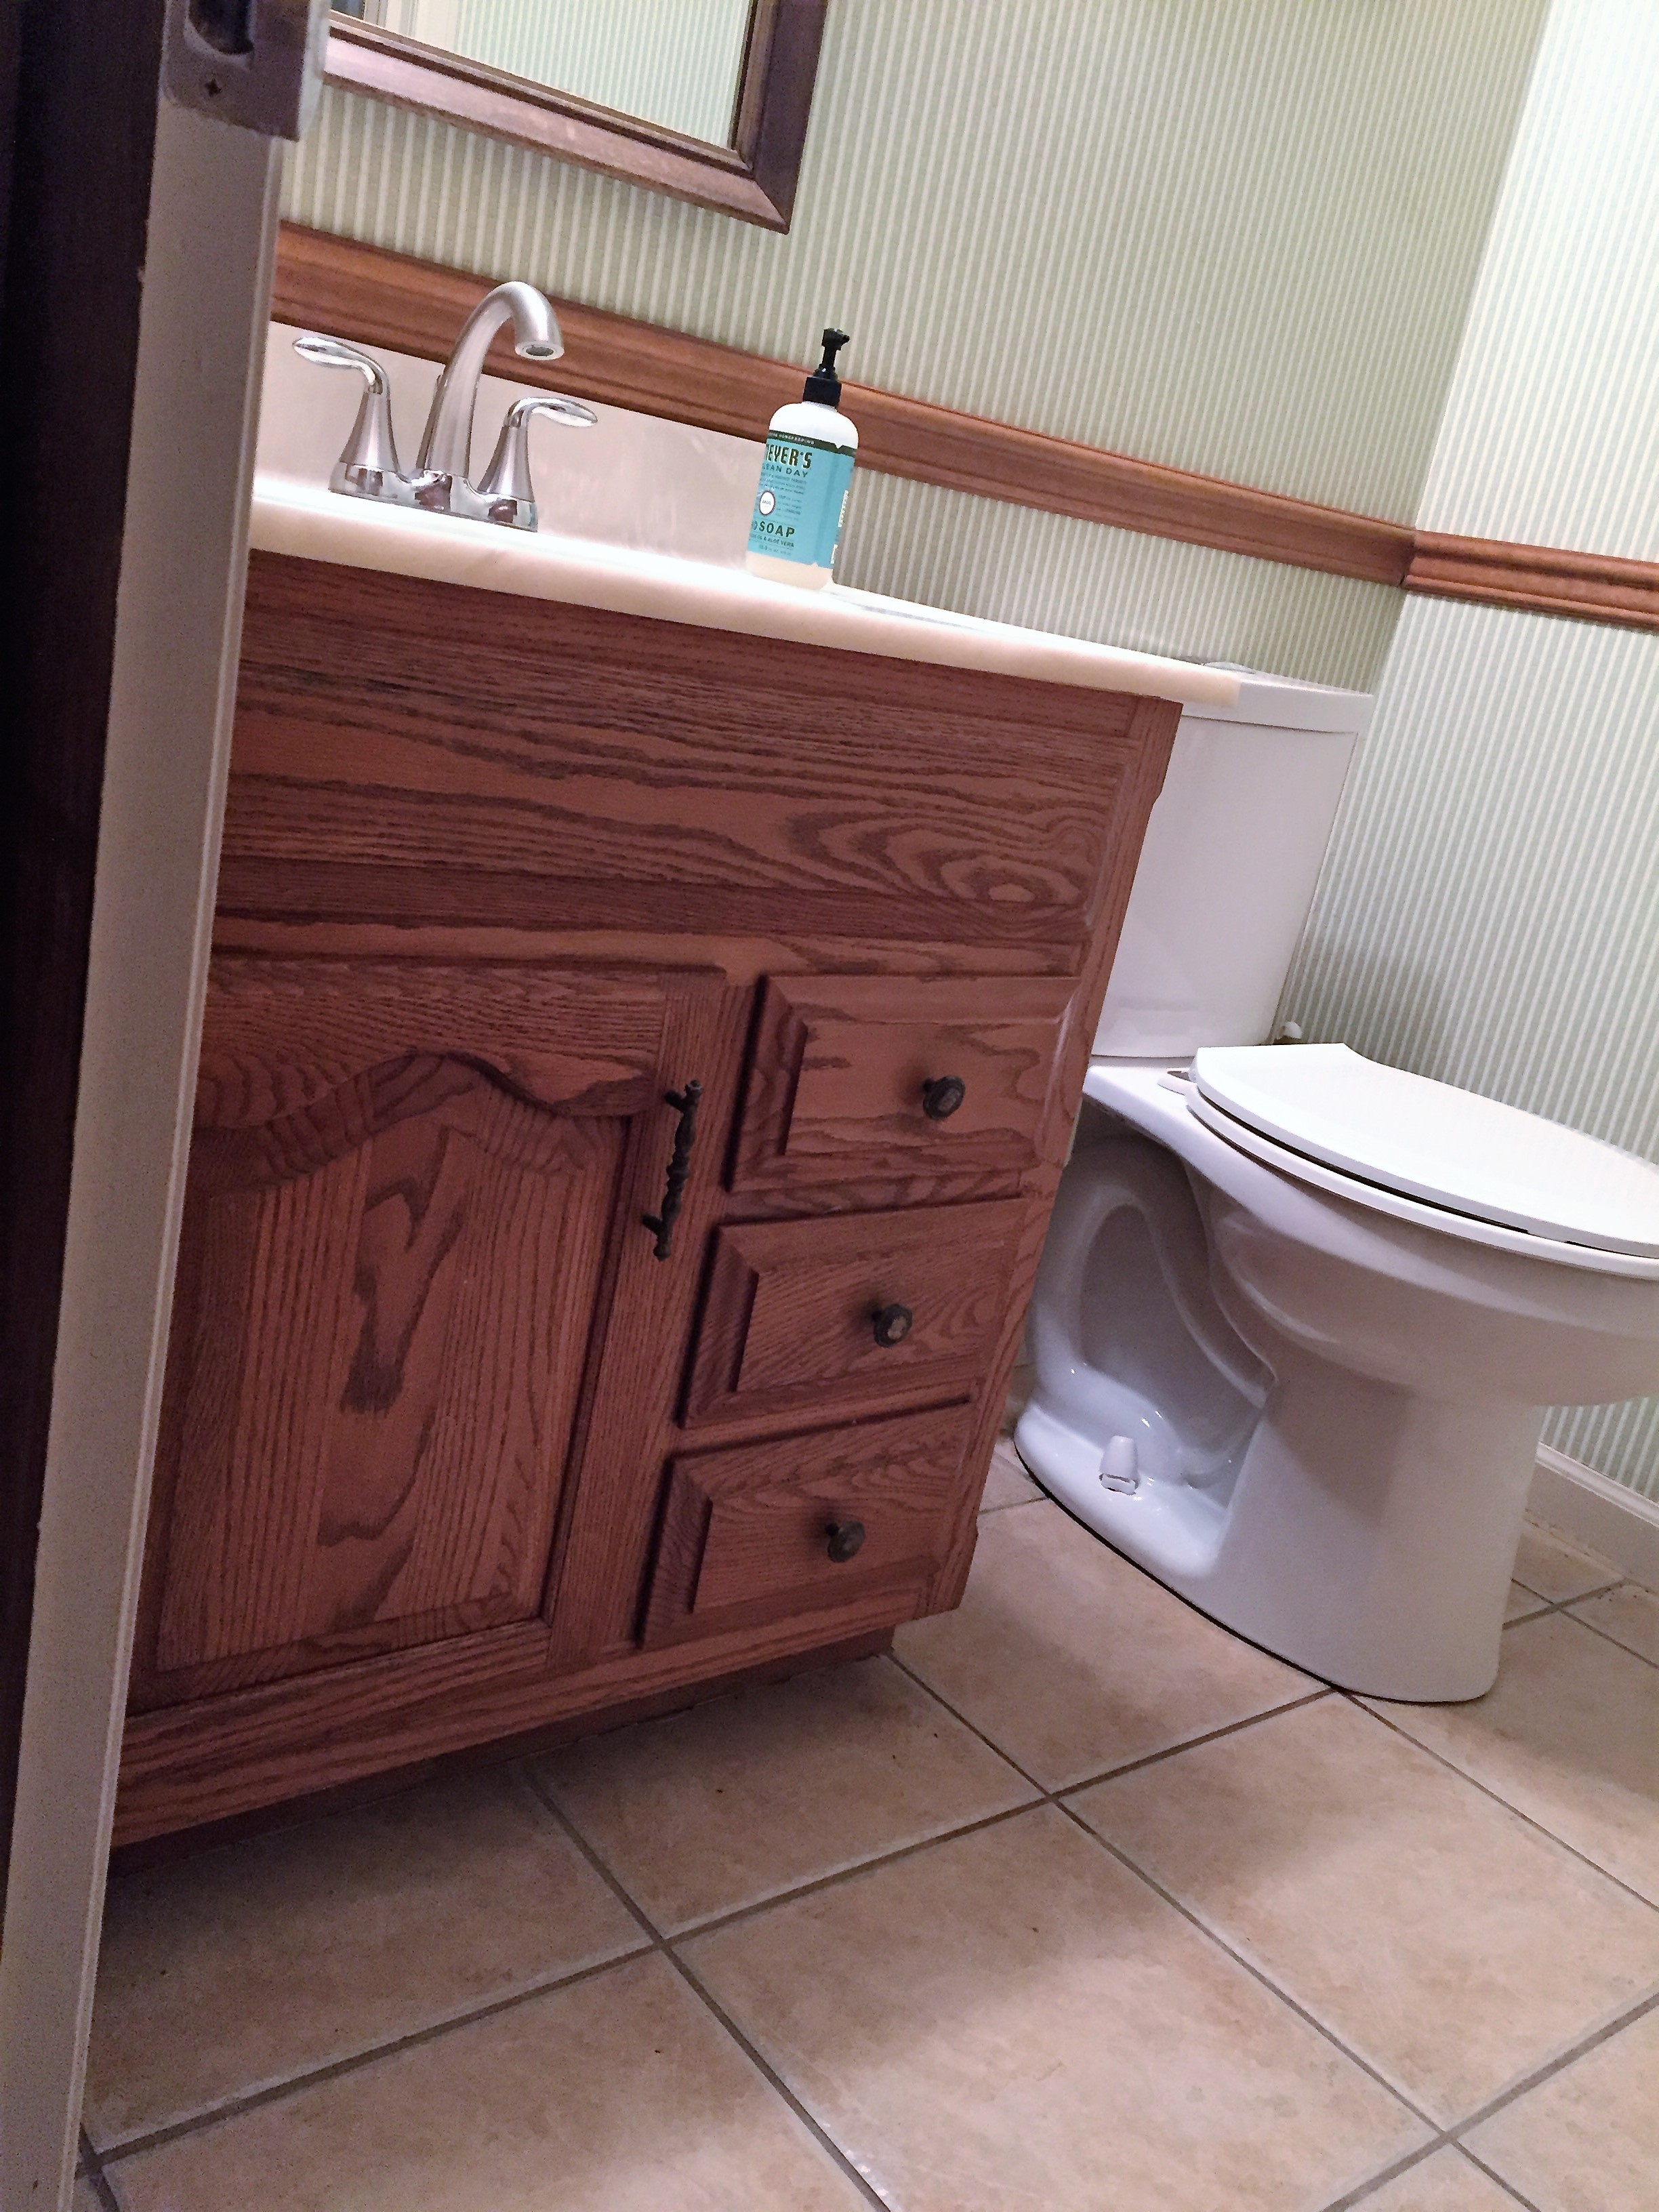 Builder grade vanity in half bathroom